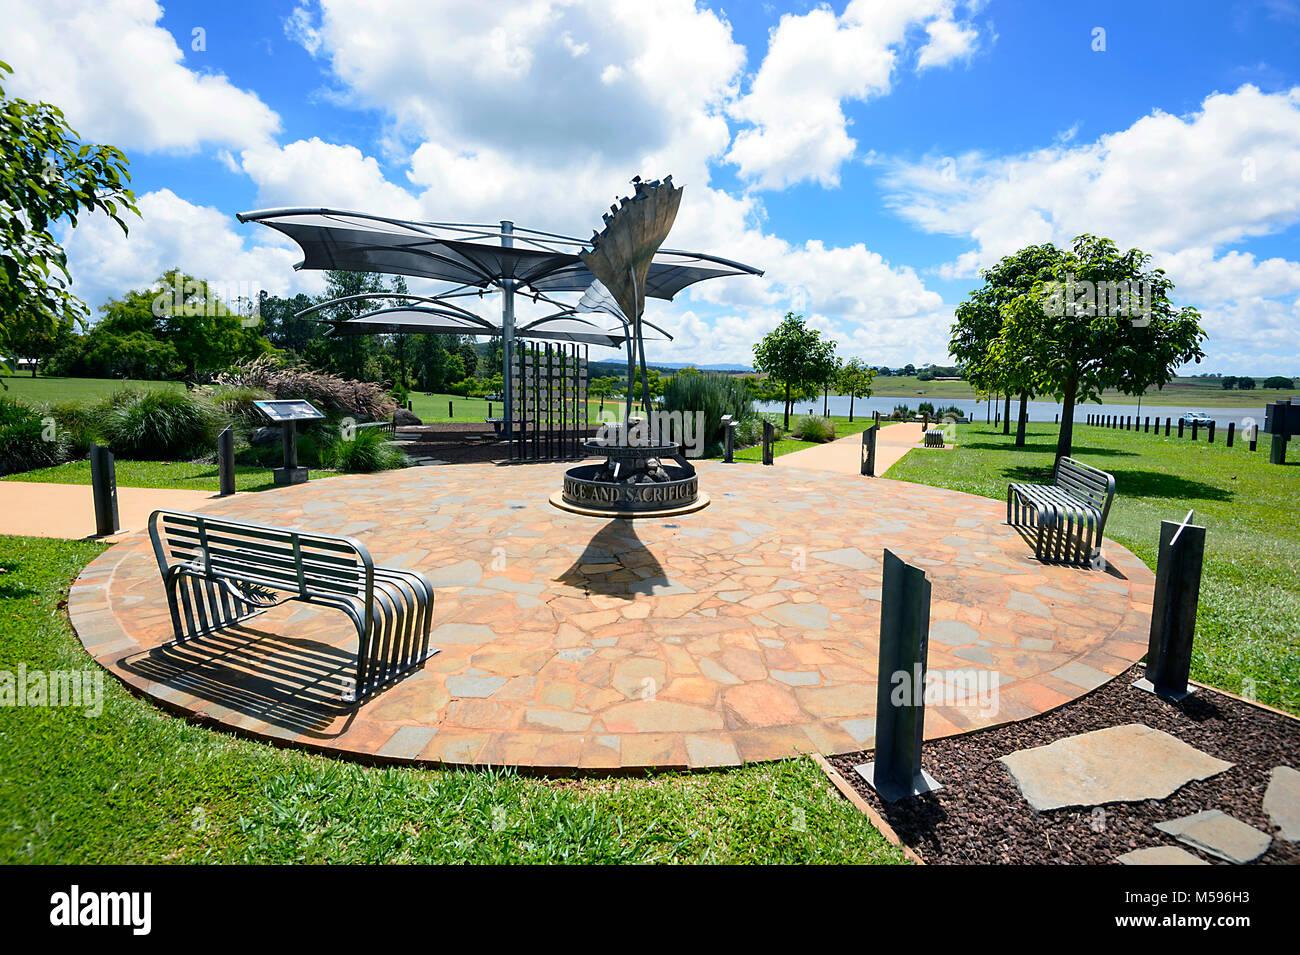 Afghanistan war memorial, Avenue of Honour, Yungaburra, Atherton Tablelands, Far North Queensland, FNQ, QLD, Australia - Stock Image